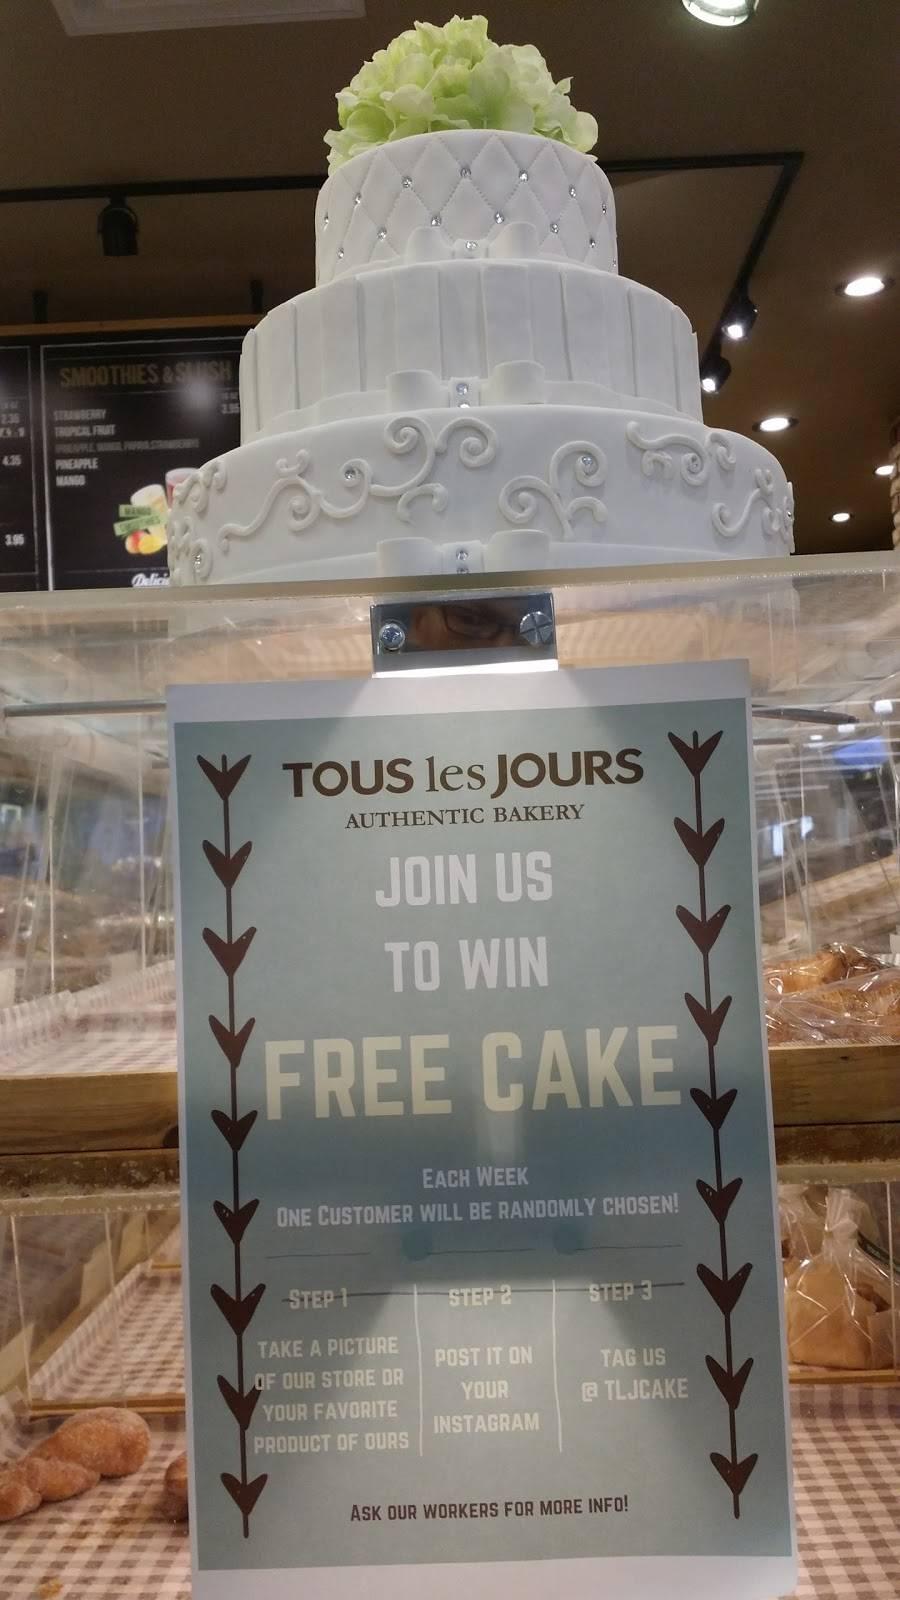 Tous les Jours - bakery  | Photo 7 of 10 | Address: 3320 K Ave #218, Plano, TX 75074, USA | Phone: (469) 814-0882